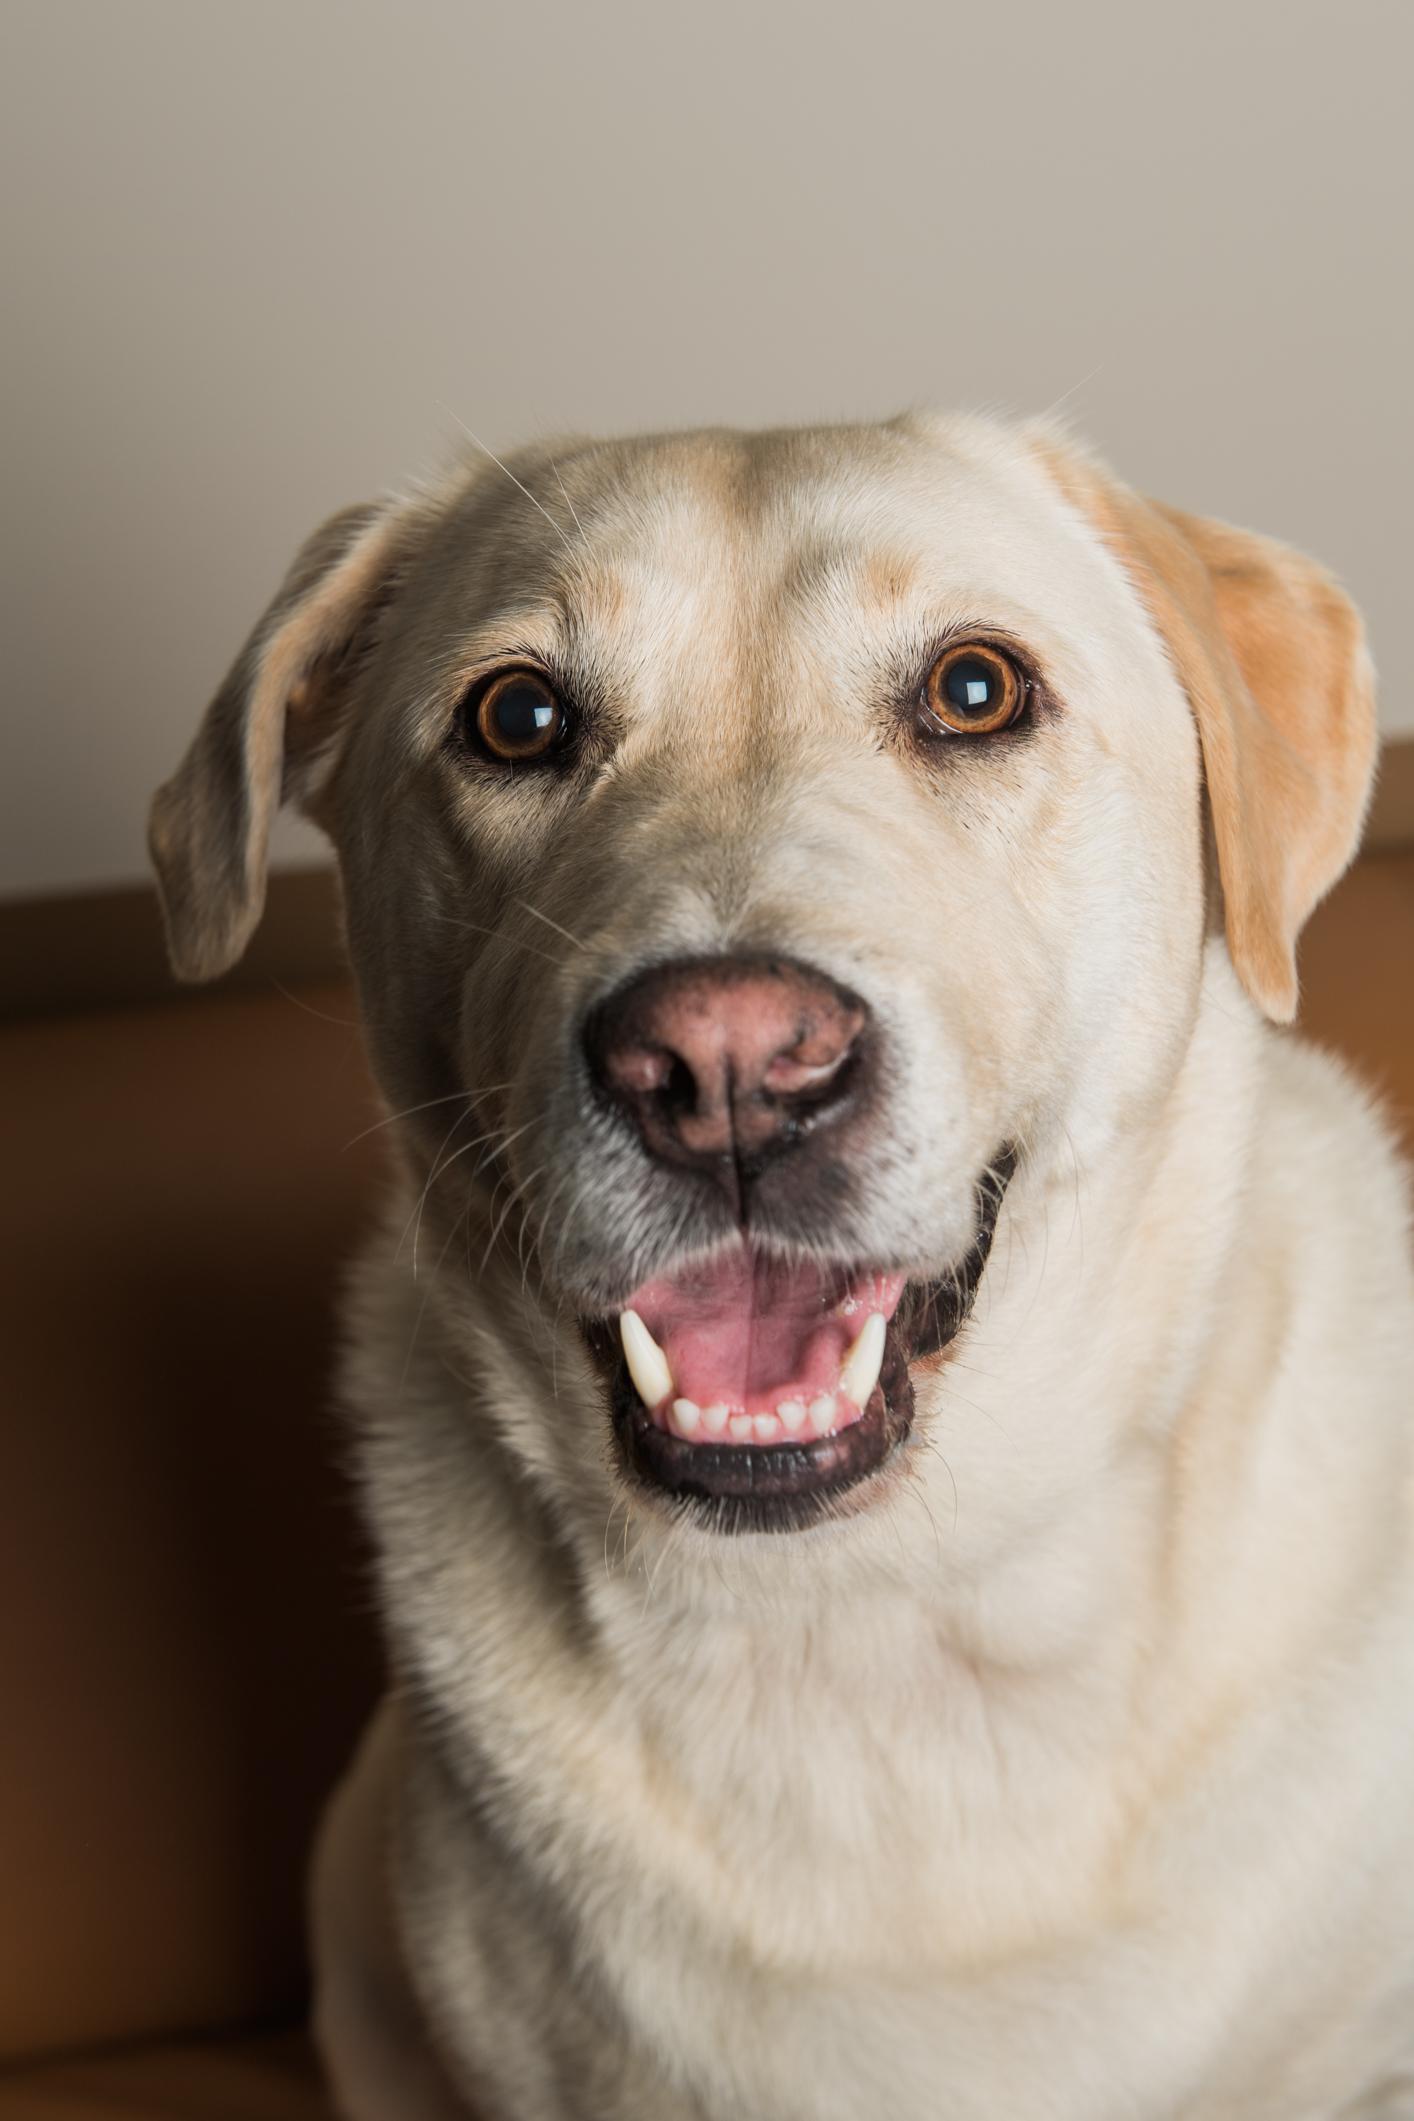 Roxy - Date of birth: 16/06/2012Breed: Labrador Retriever, YellowLikes: Treats, bum scratches, game of tug-o-war, wagging my tail no matter what!@gooddogaai